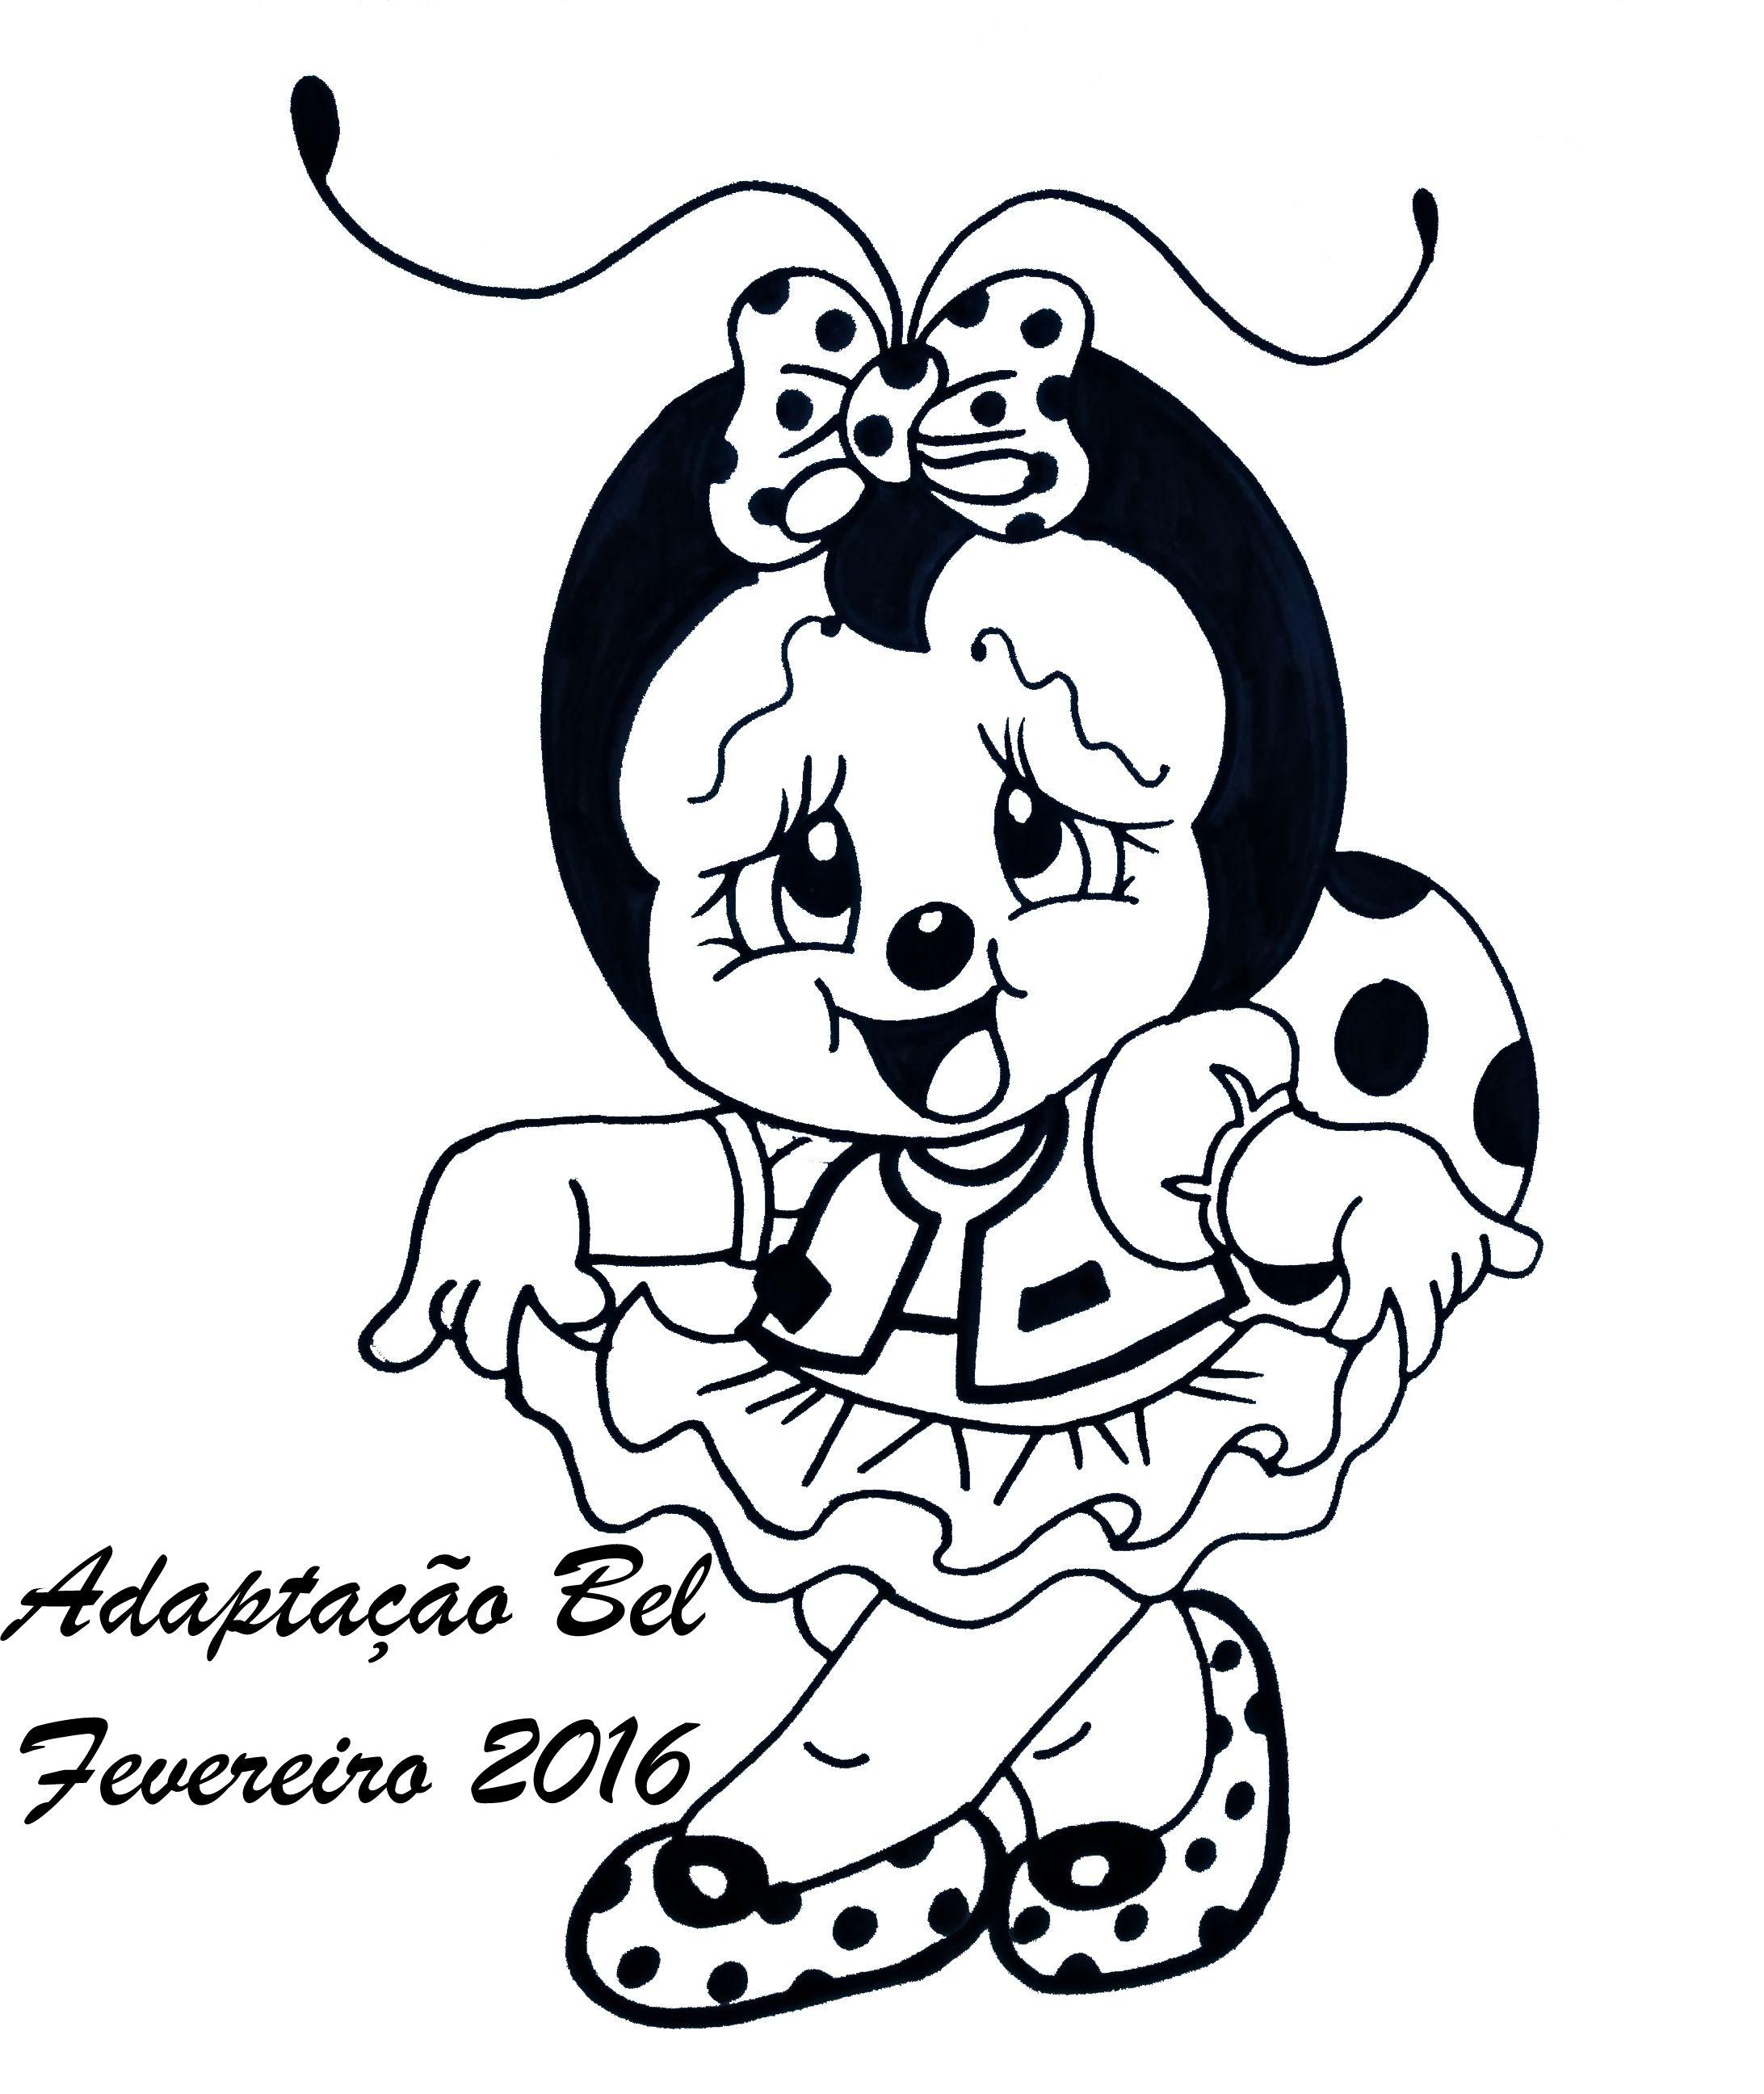 pin by isabel cristina trivelato on desenhos de joaninhas